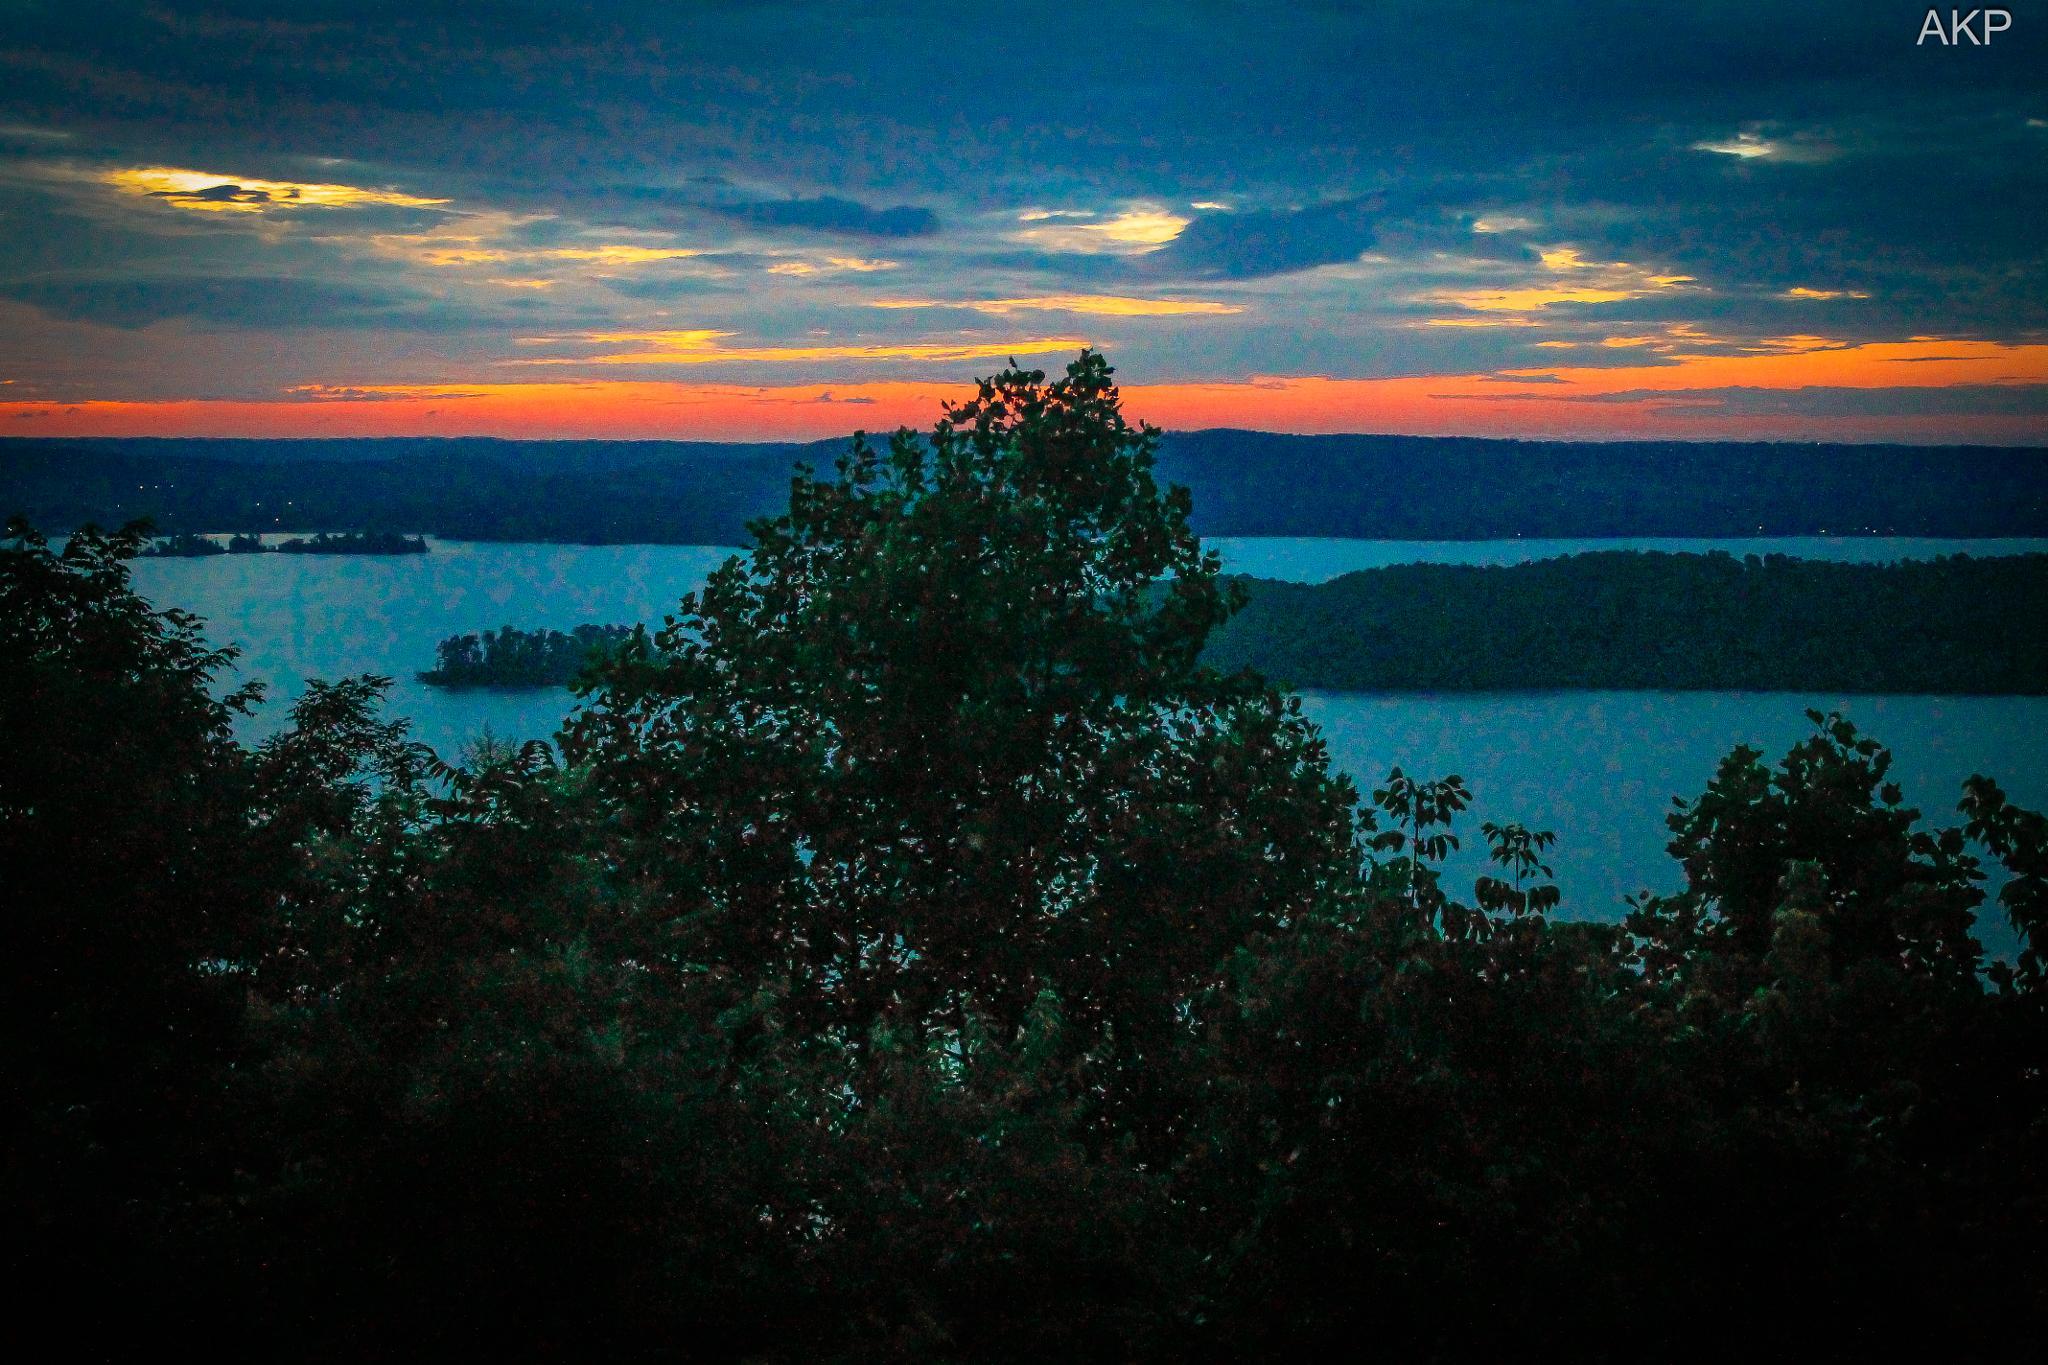 Lake Guntersville AL State Park by Art King